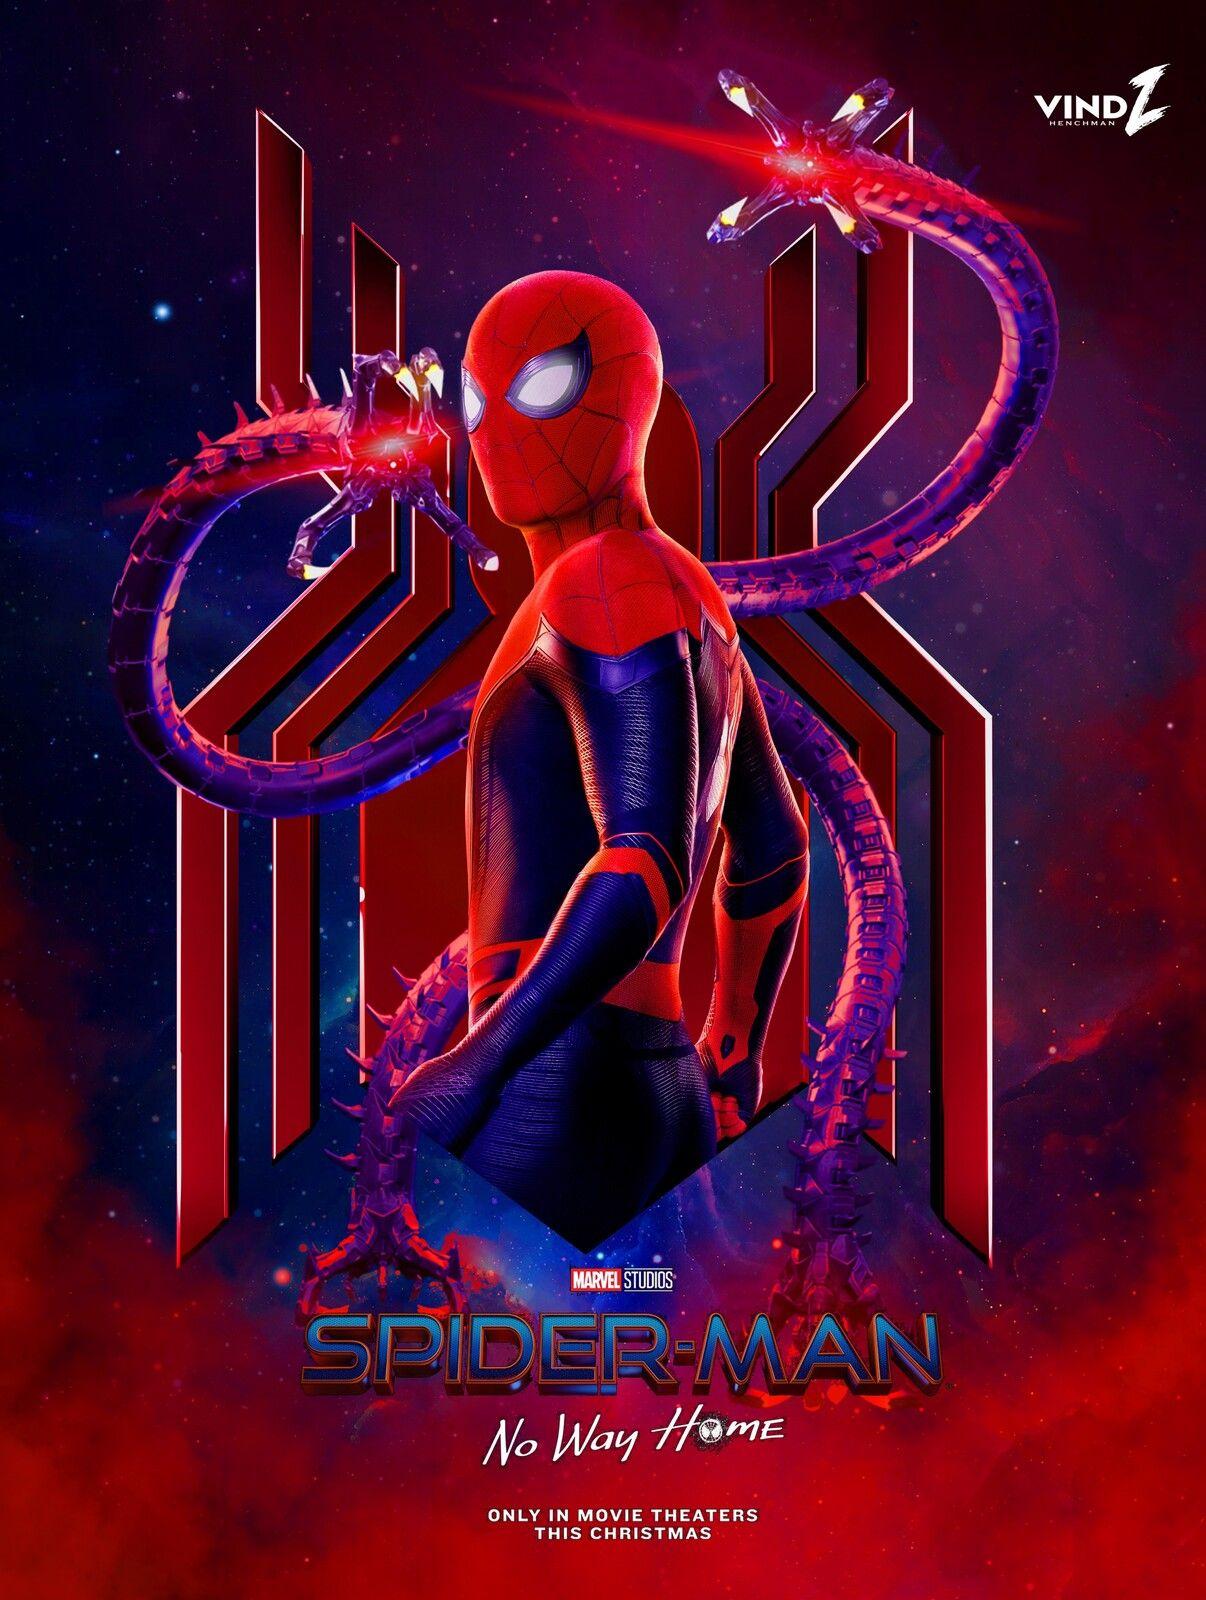 Spider-Man: No Way Home (2021) Poster #4